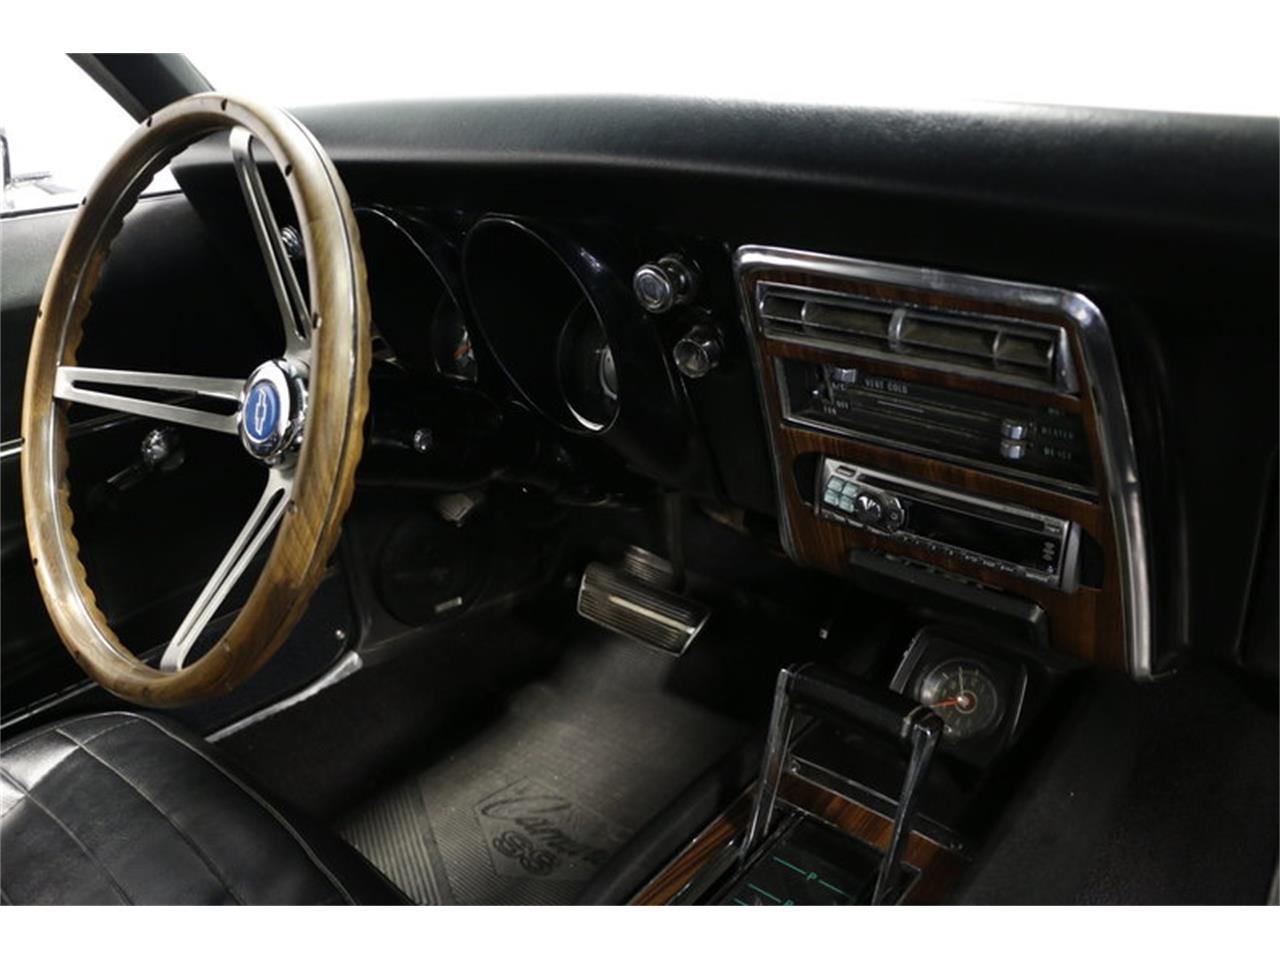 1968 Camaro Console Dakota Digital Wiring Diagram Large Picture Of Located In Texas 1280x960